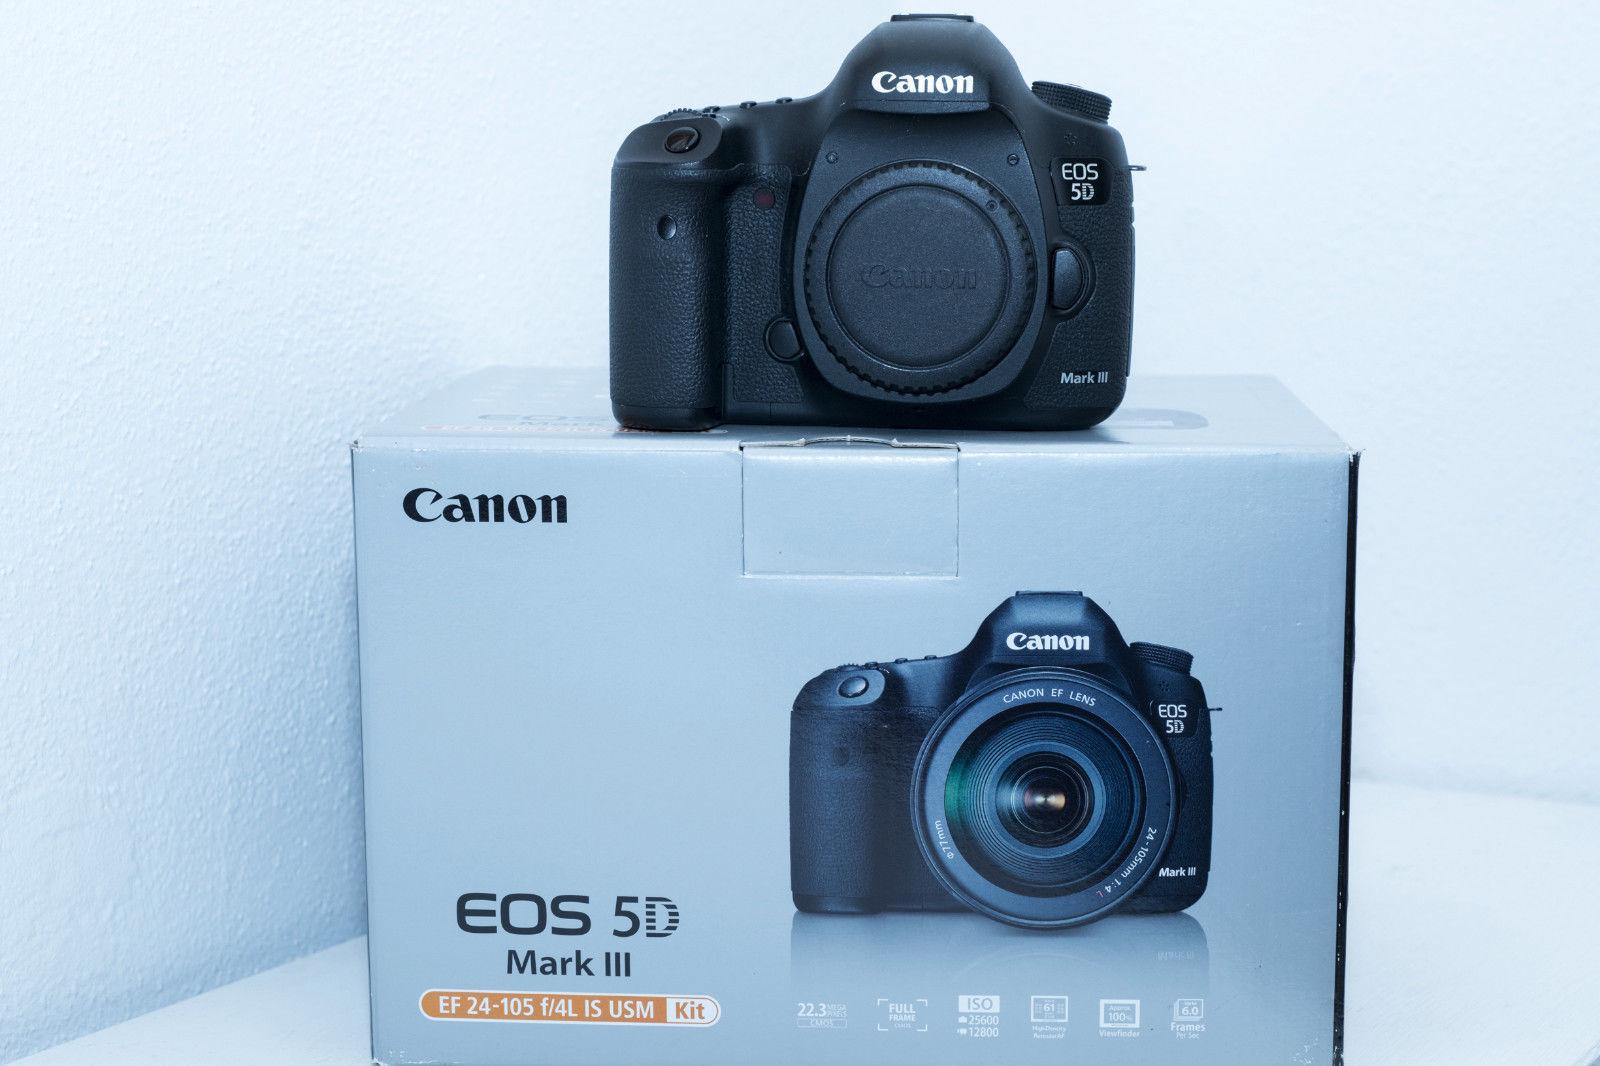 Canon EOS 5D Mark III 22.3 MP SLR-Digitalkamera (Nur Gehäuse) *Zubehörpaket* TOP